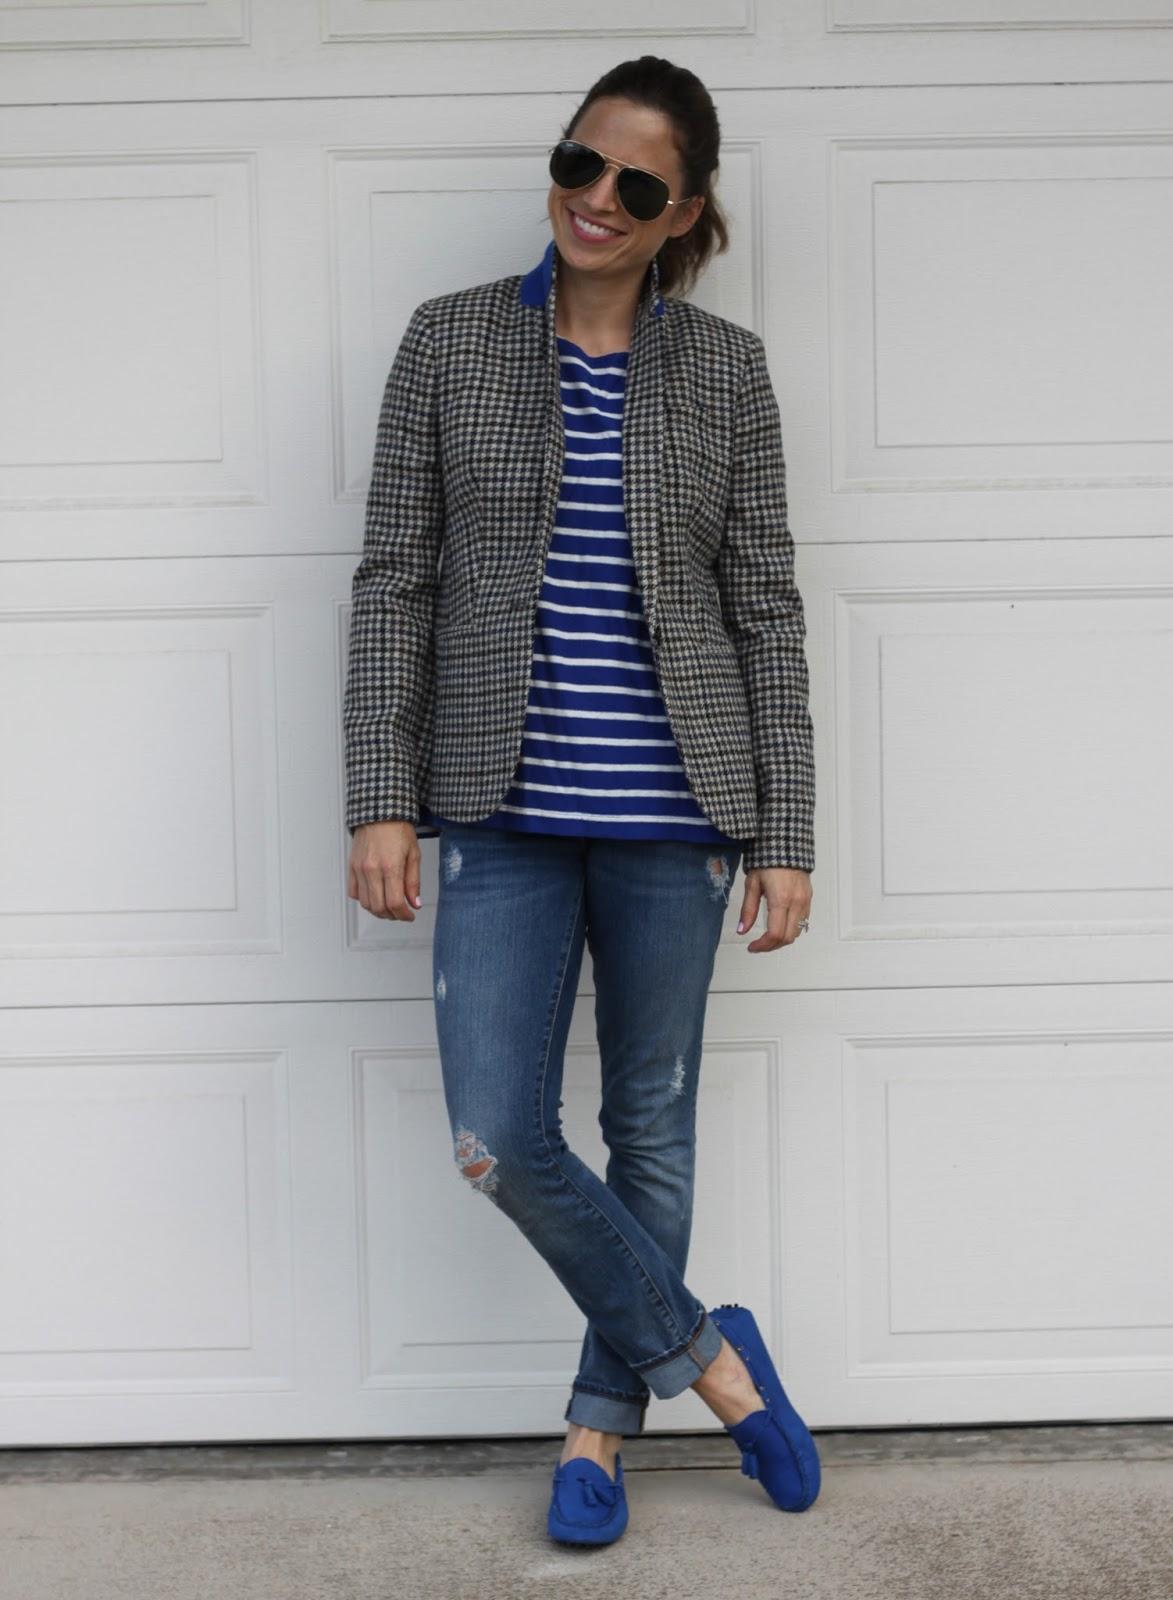 stripes and tweed